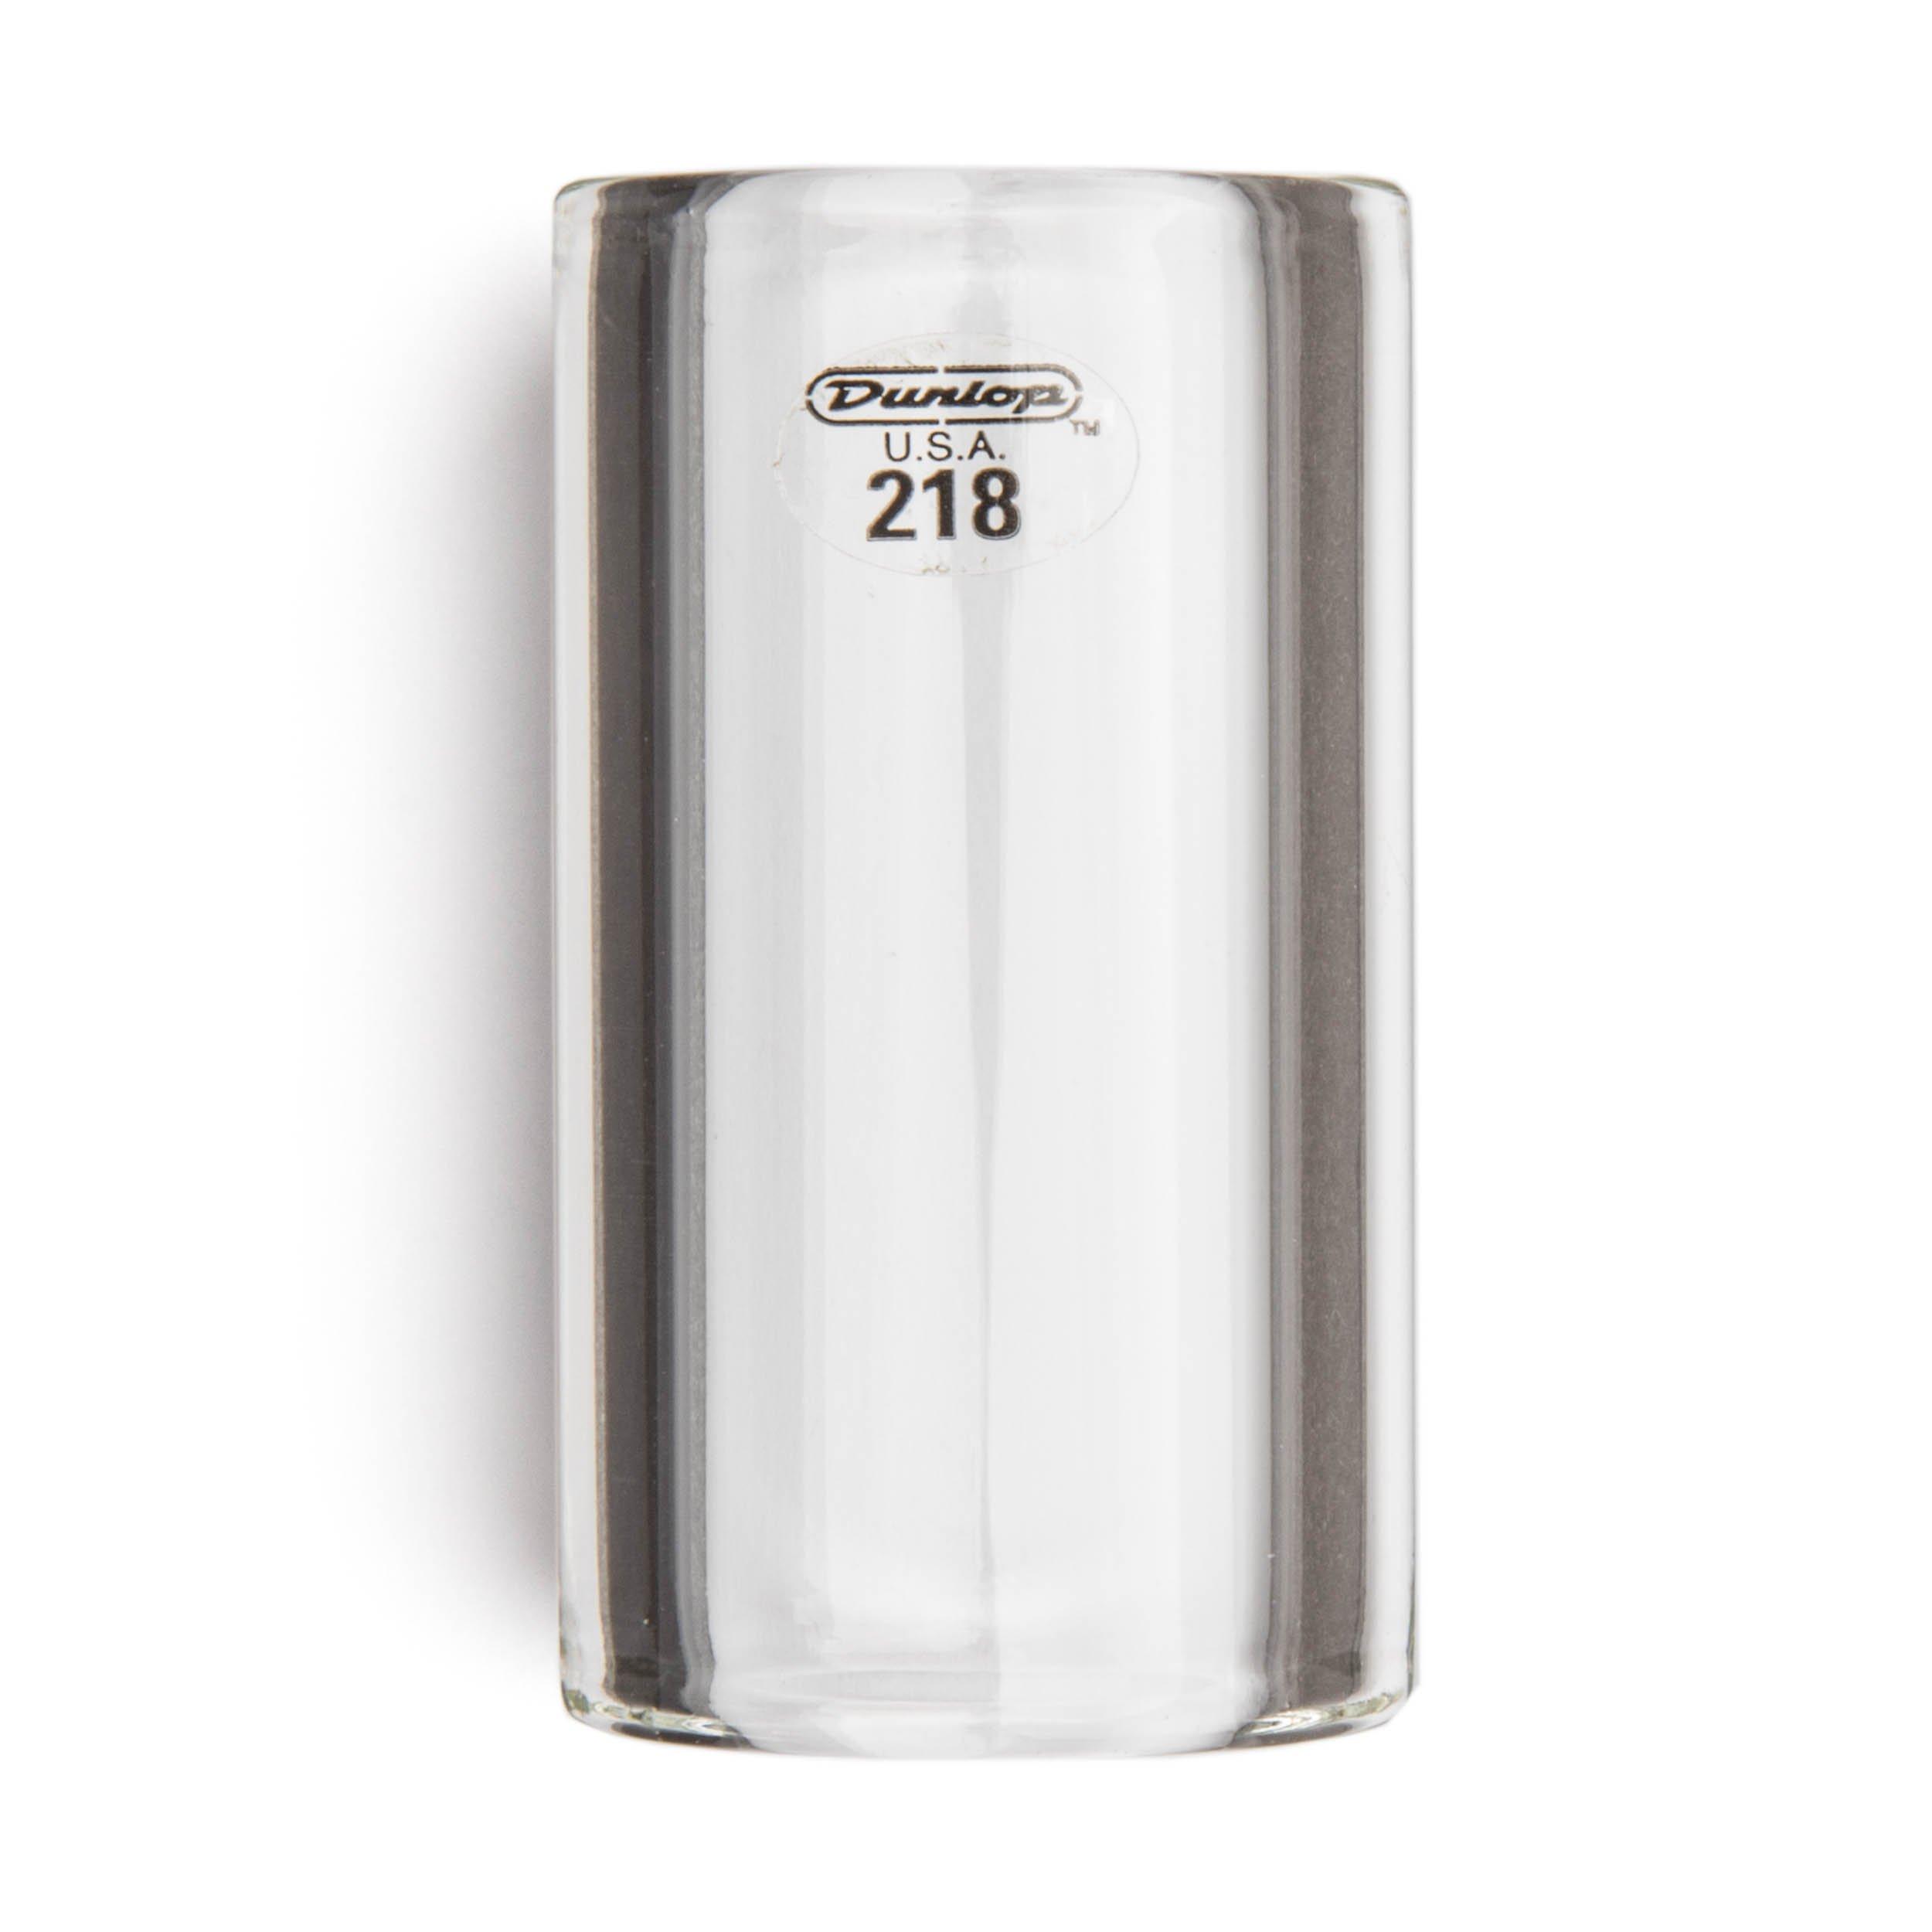 Dunlop 218 Tempered Glass Slide, Heavy Wall Thickness, Medium/Short